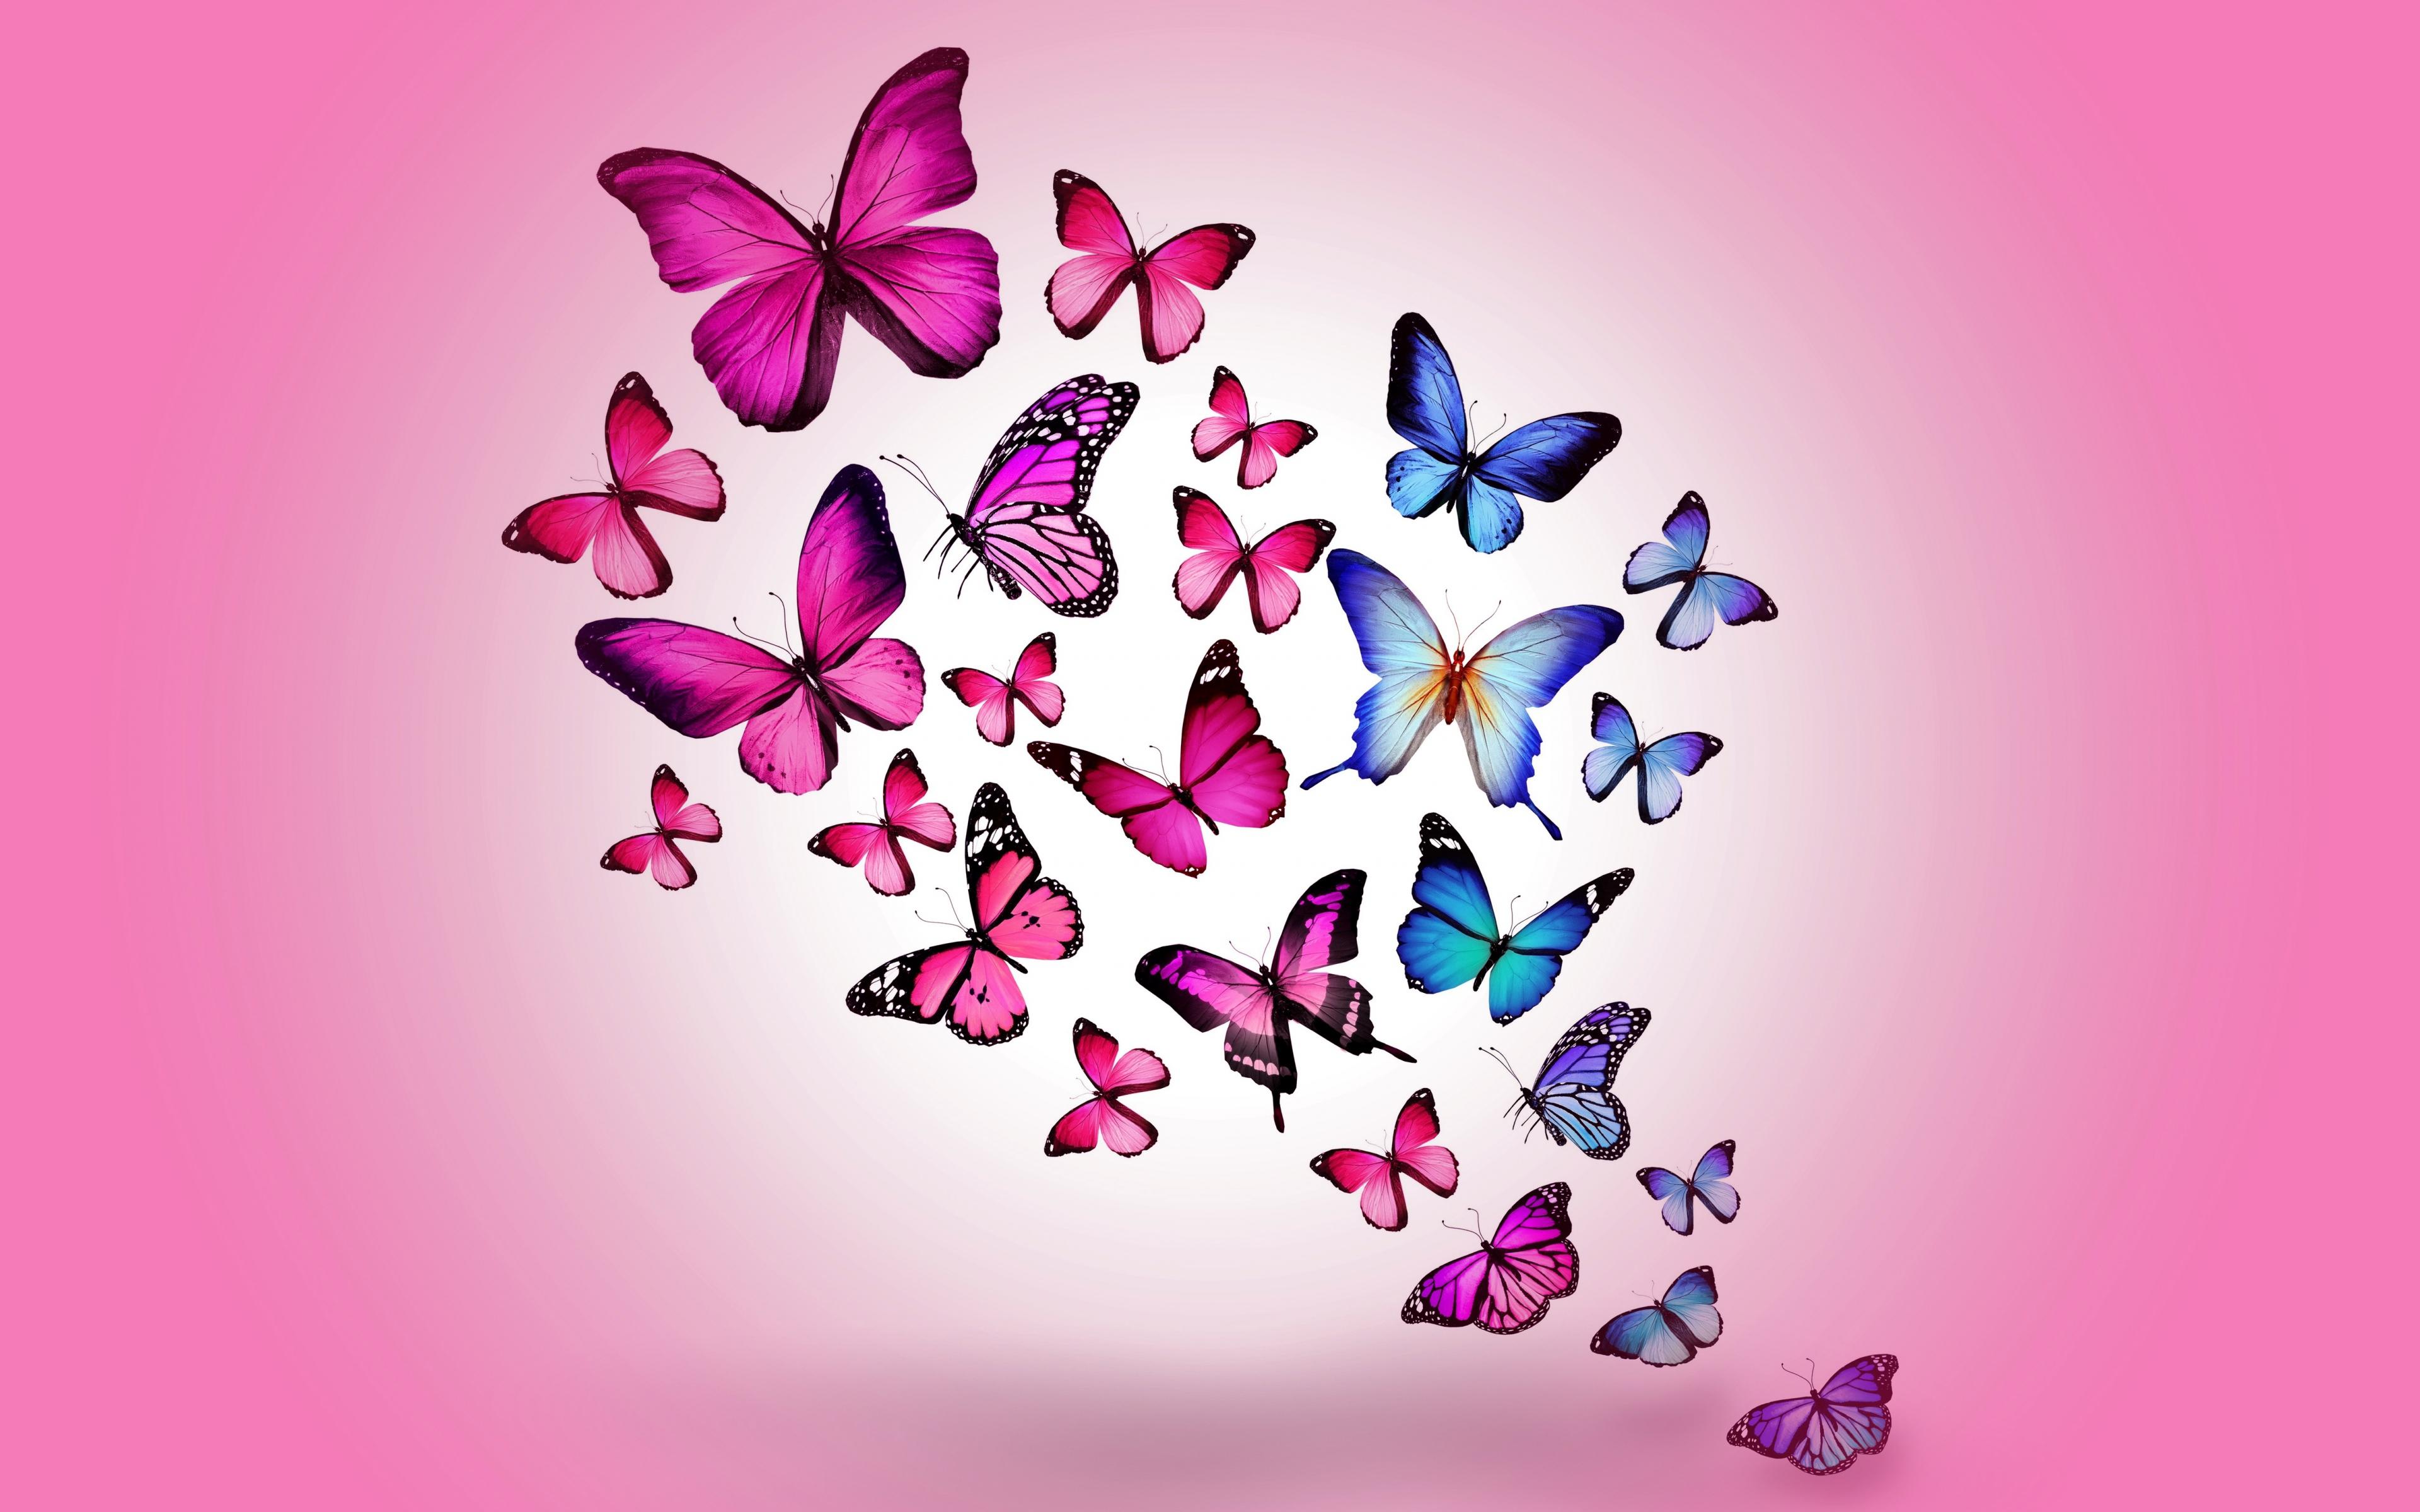 Butterfly Art 2, HD Artist, 4k Wallpapers, Images